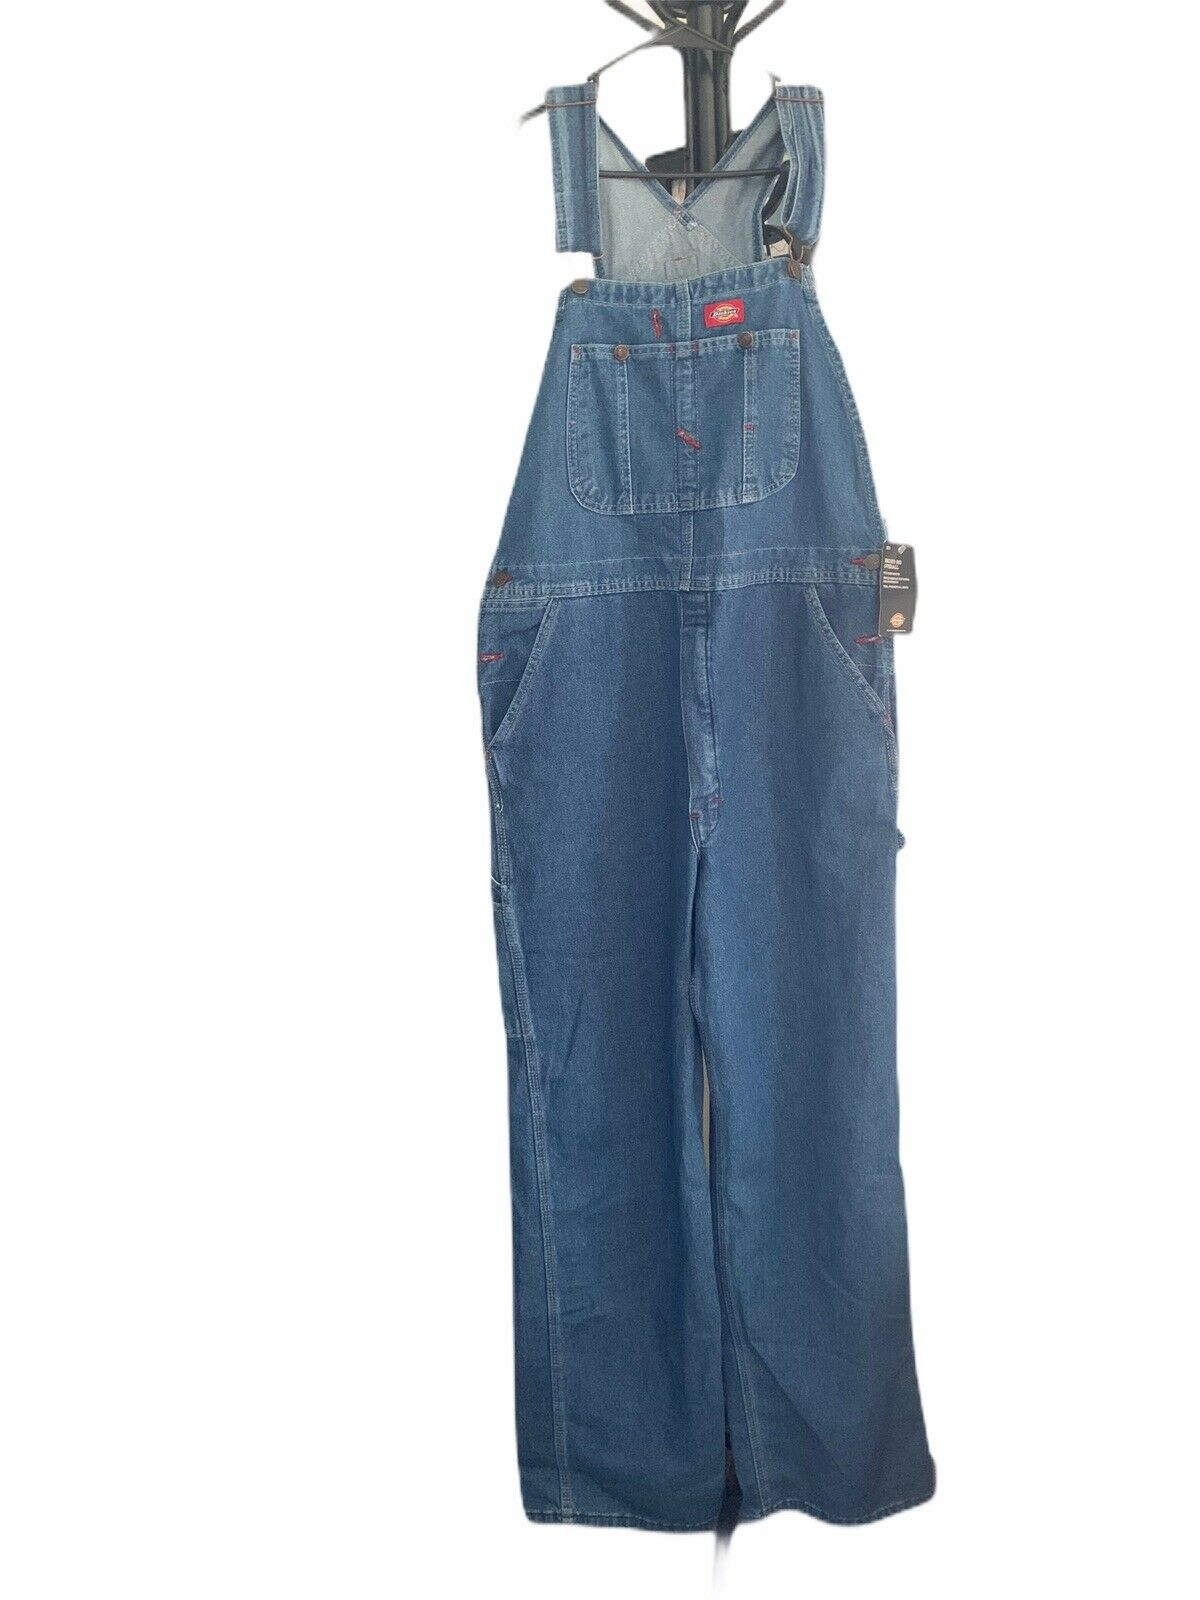 dickies overalls mens - image 1